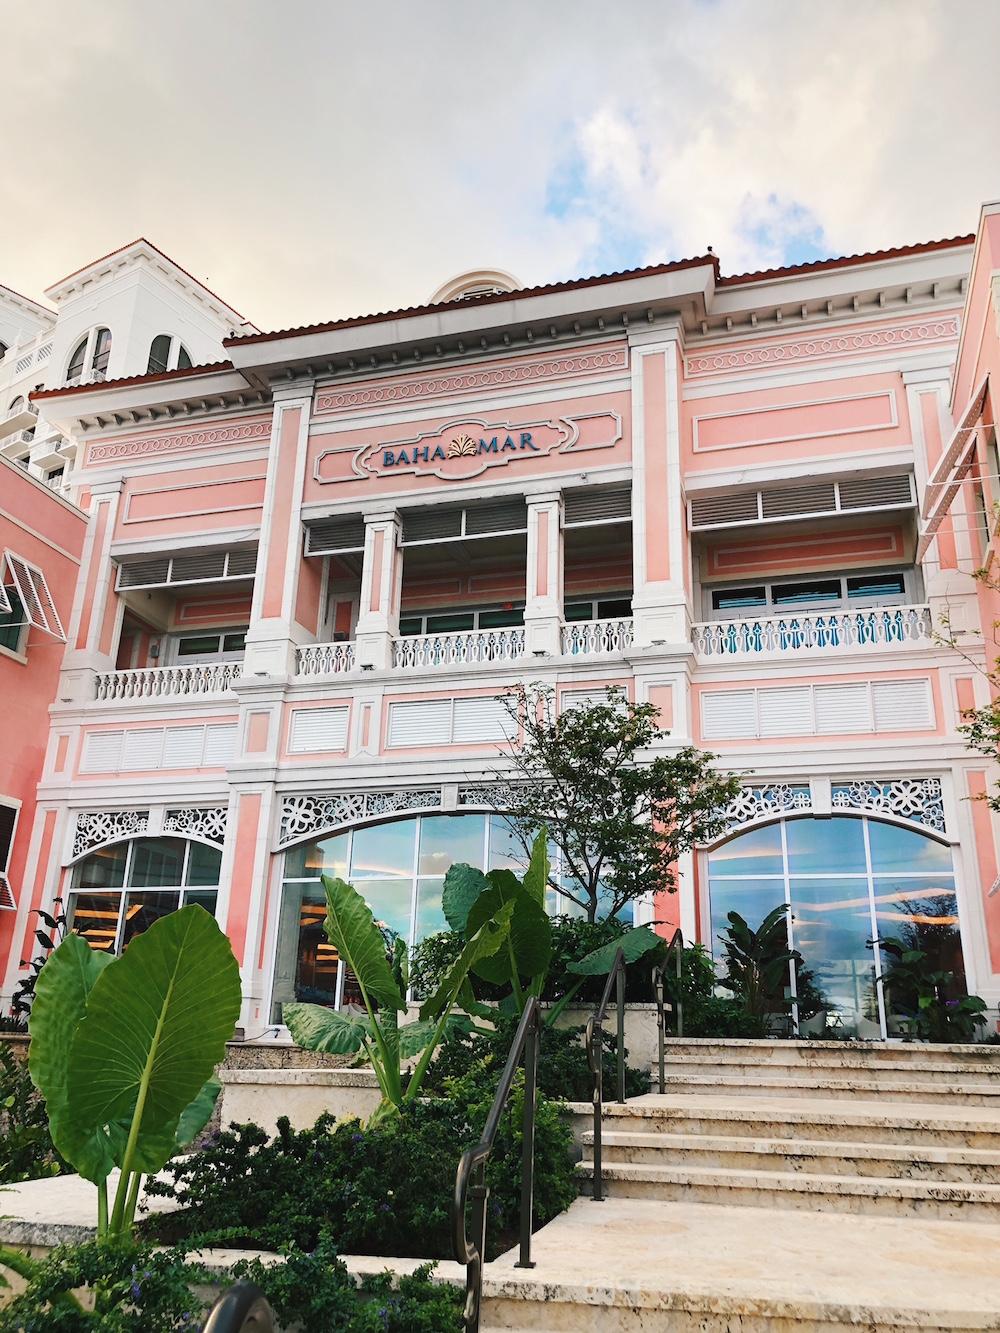 View of exterior Grand Hyatt Baha Mar pink building hotel Bahamas